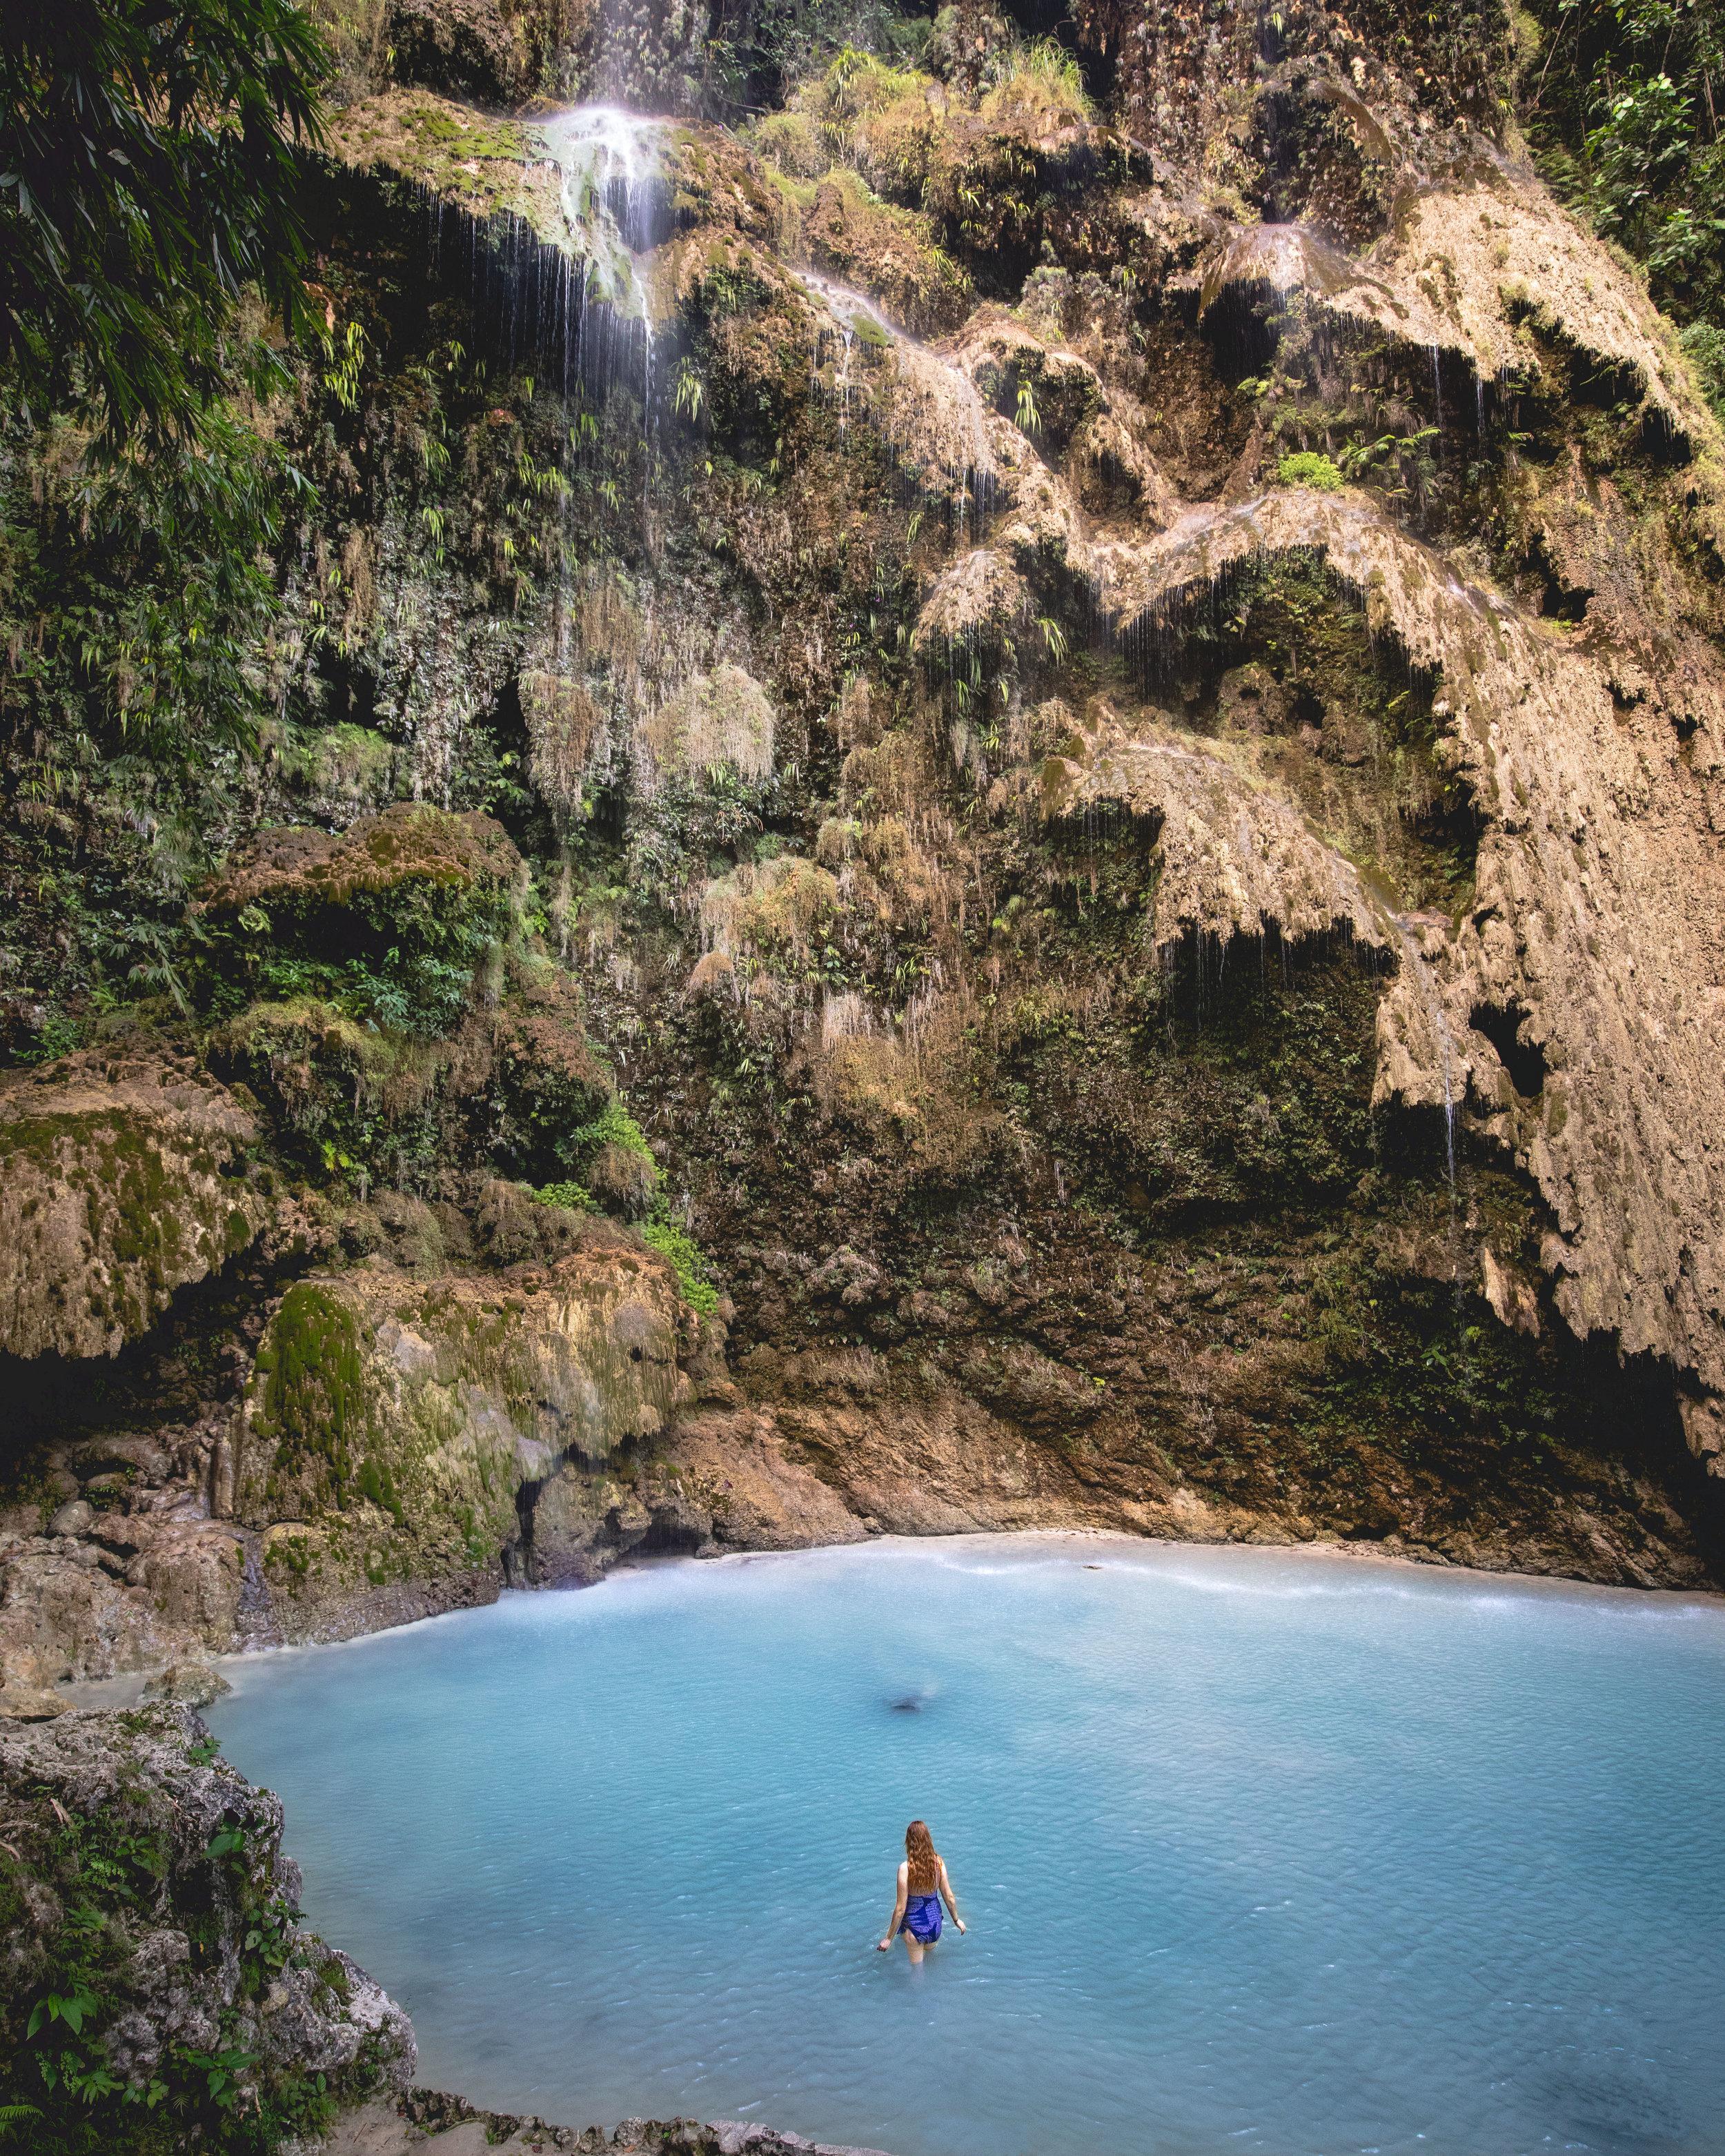 Tumalog Falls Entrance Fee